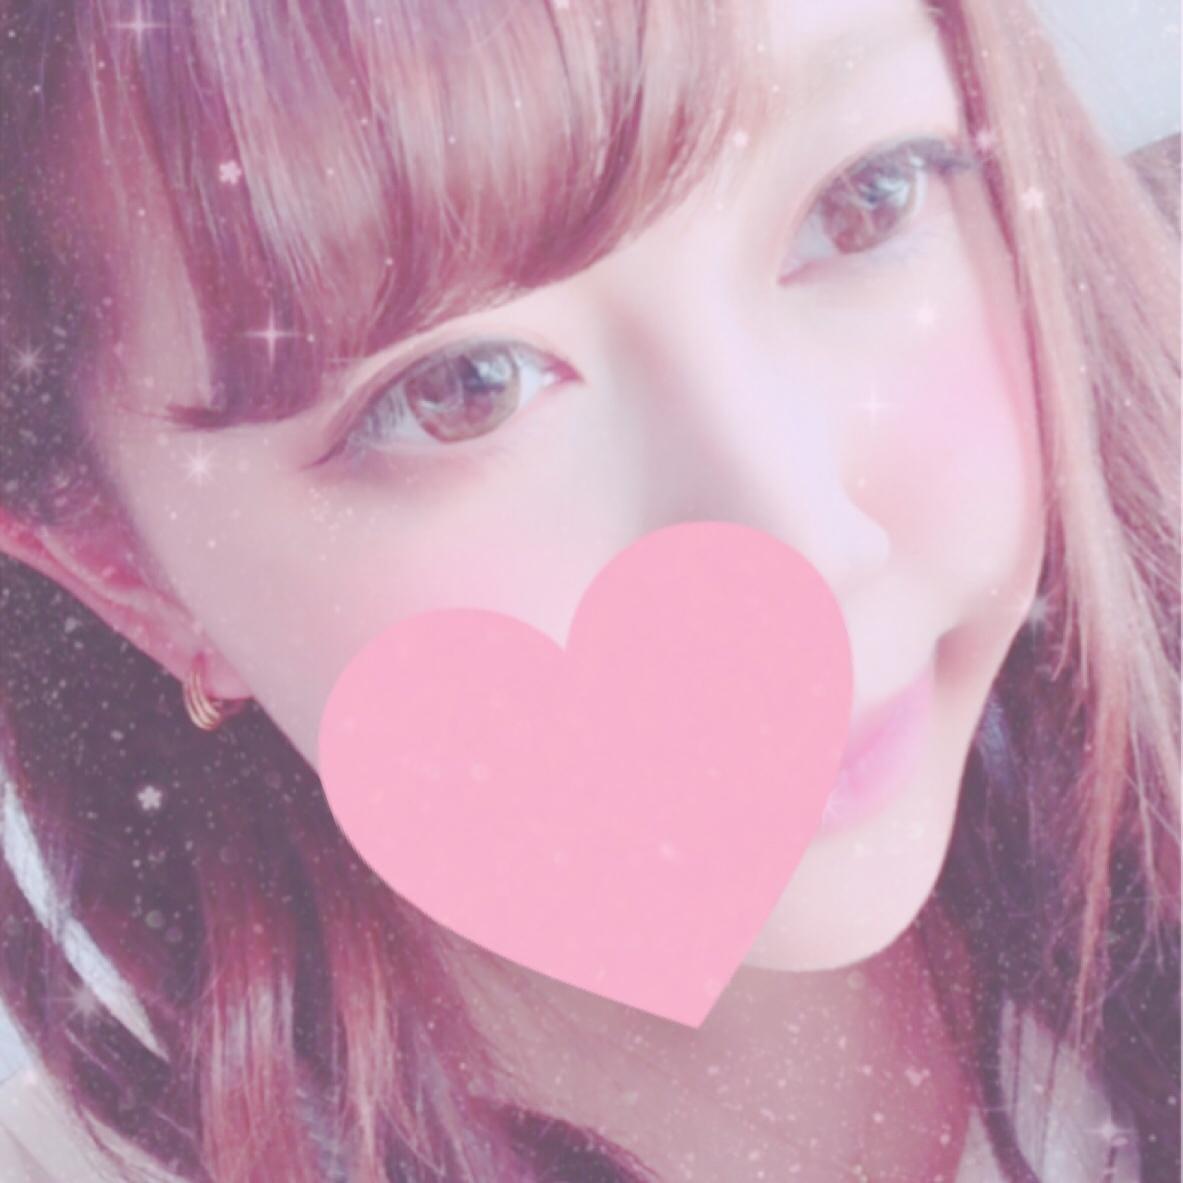 「☀︎」09/04(火) 13:01 | ユアの写メ・風俗動画